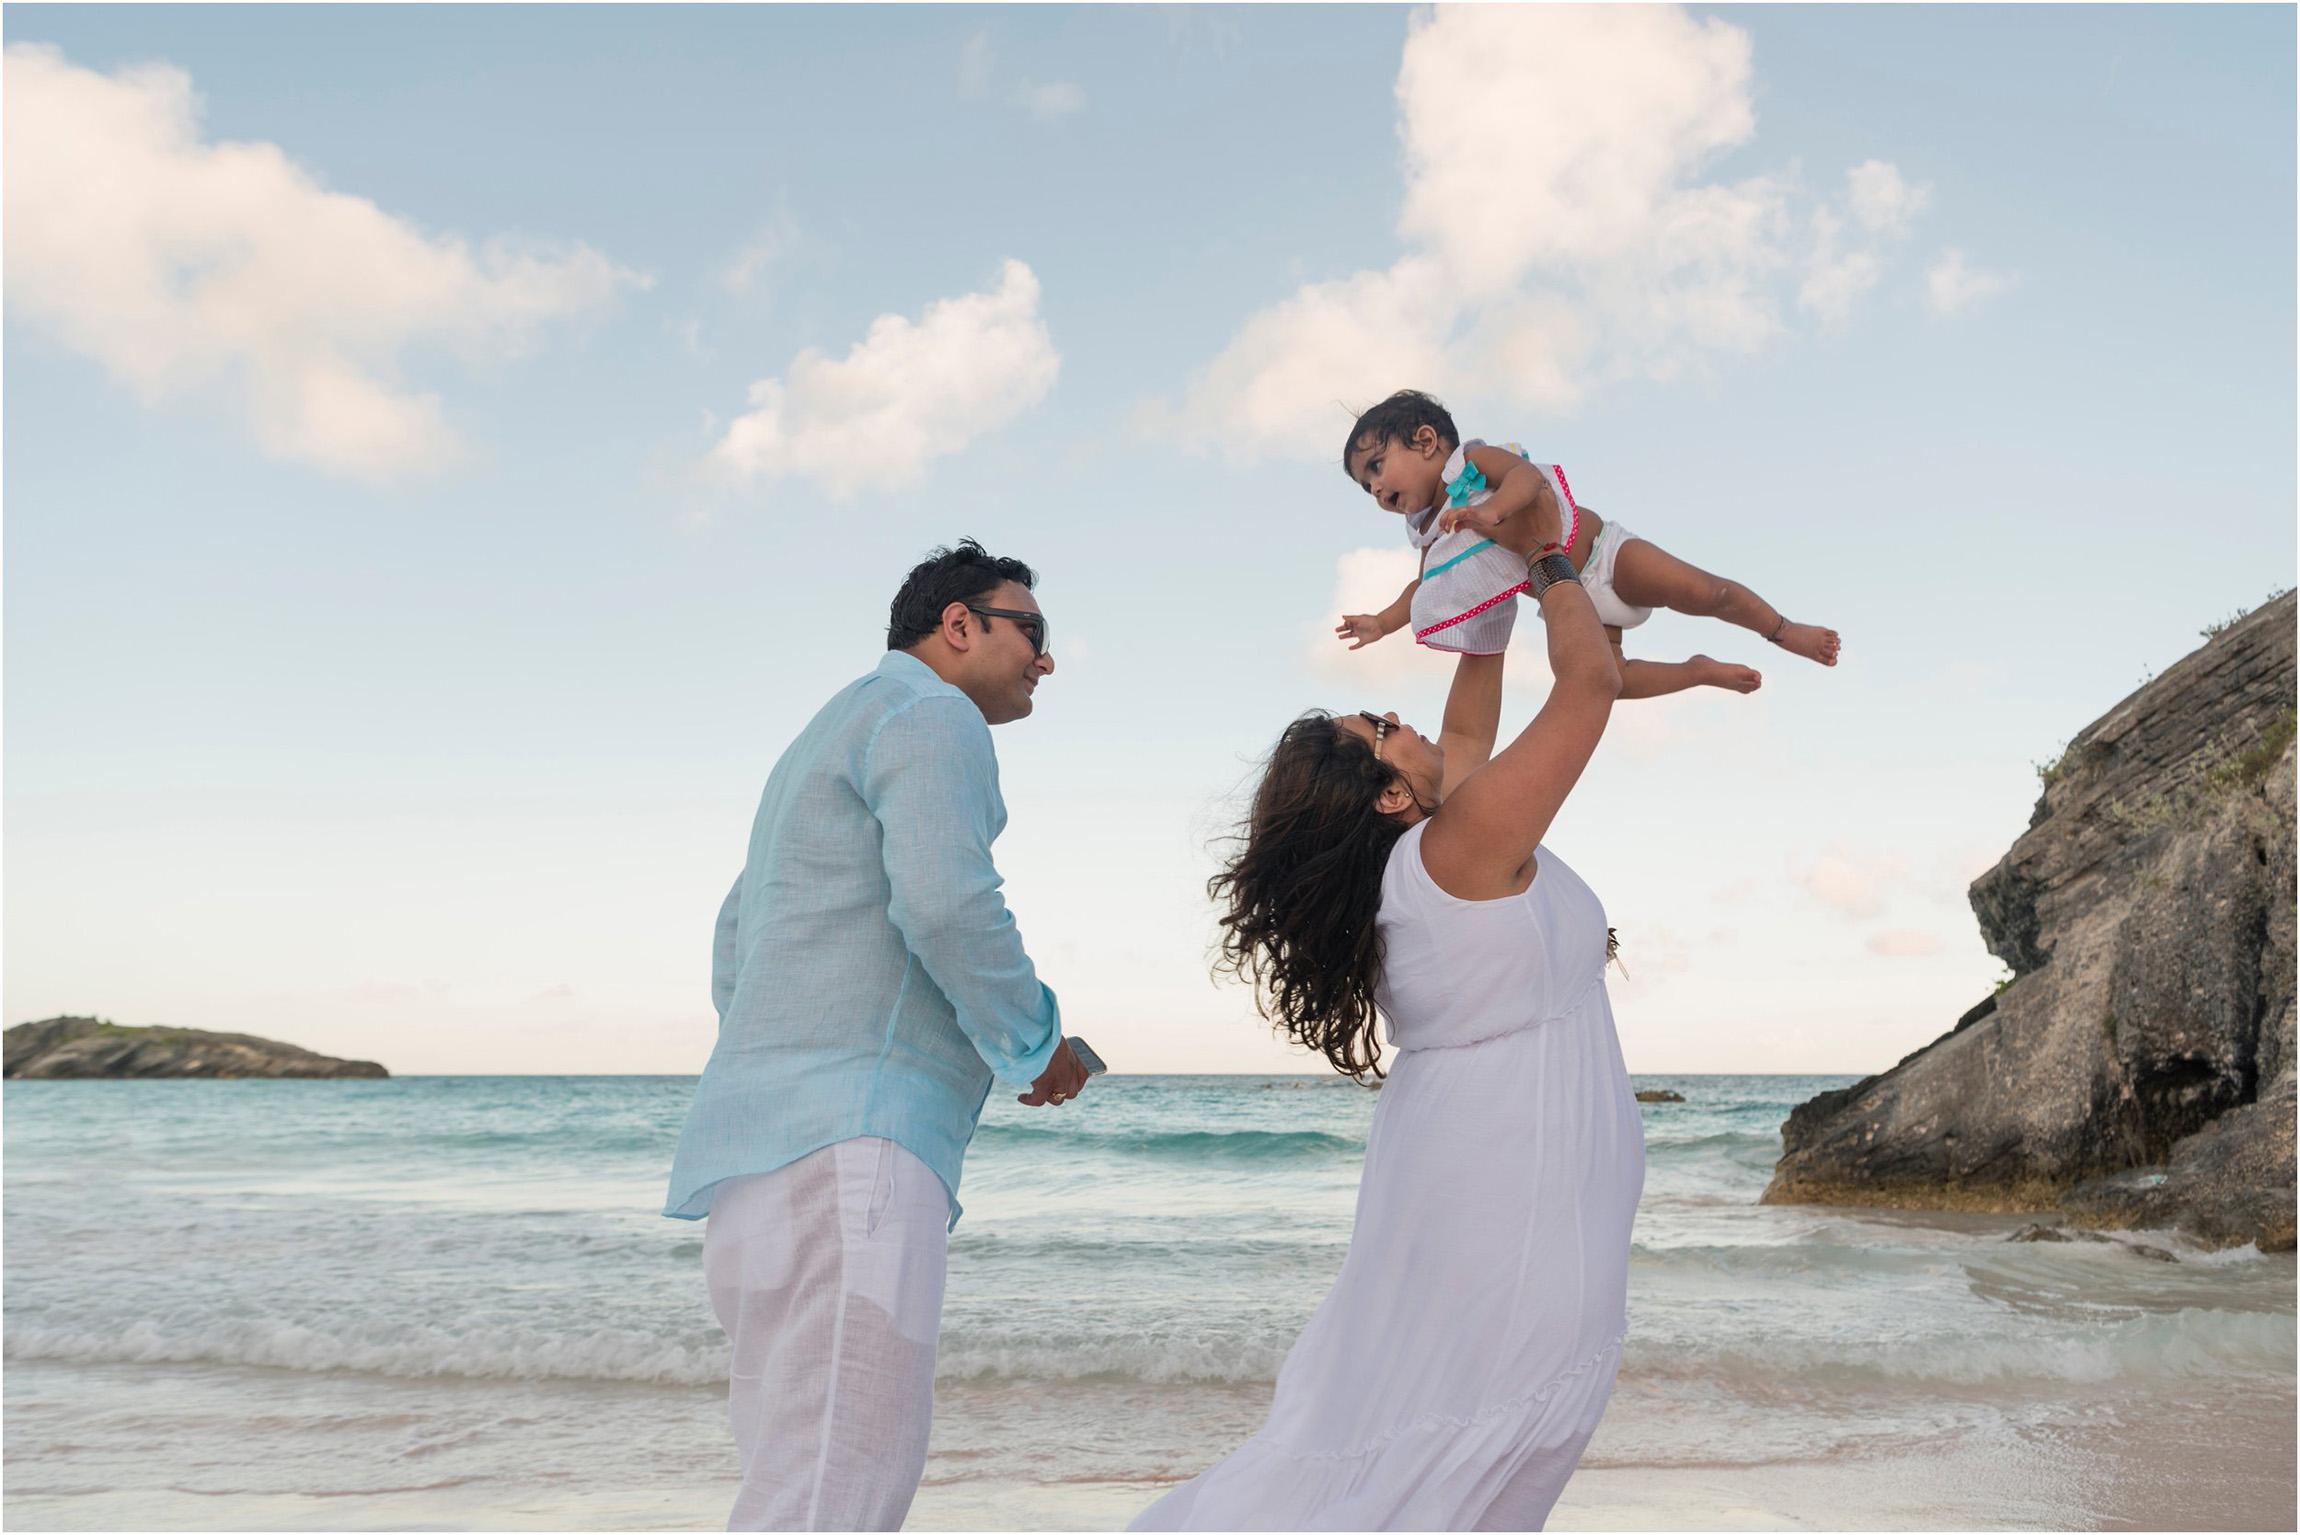 ©FianderFoto_Bermuda Photographer_Elbow Beach_Malav_022.jpg